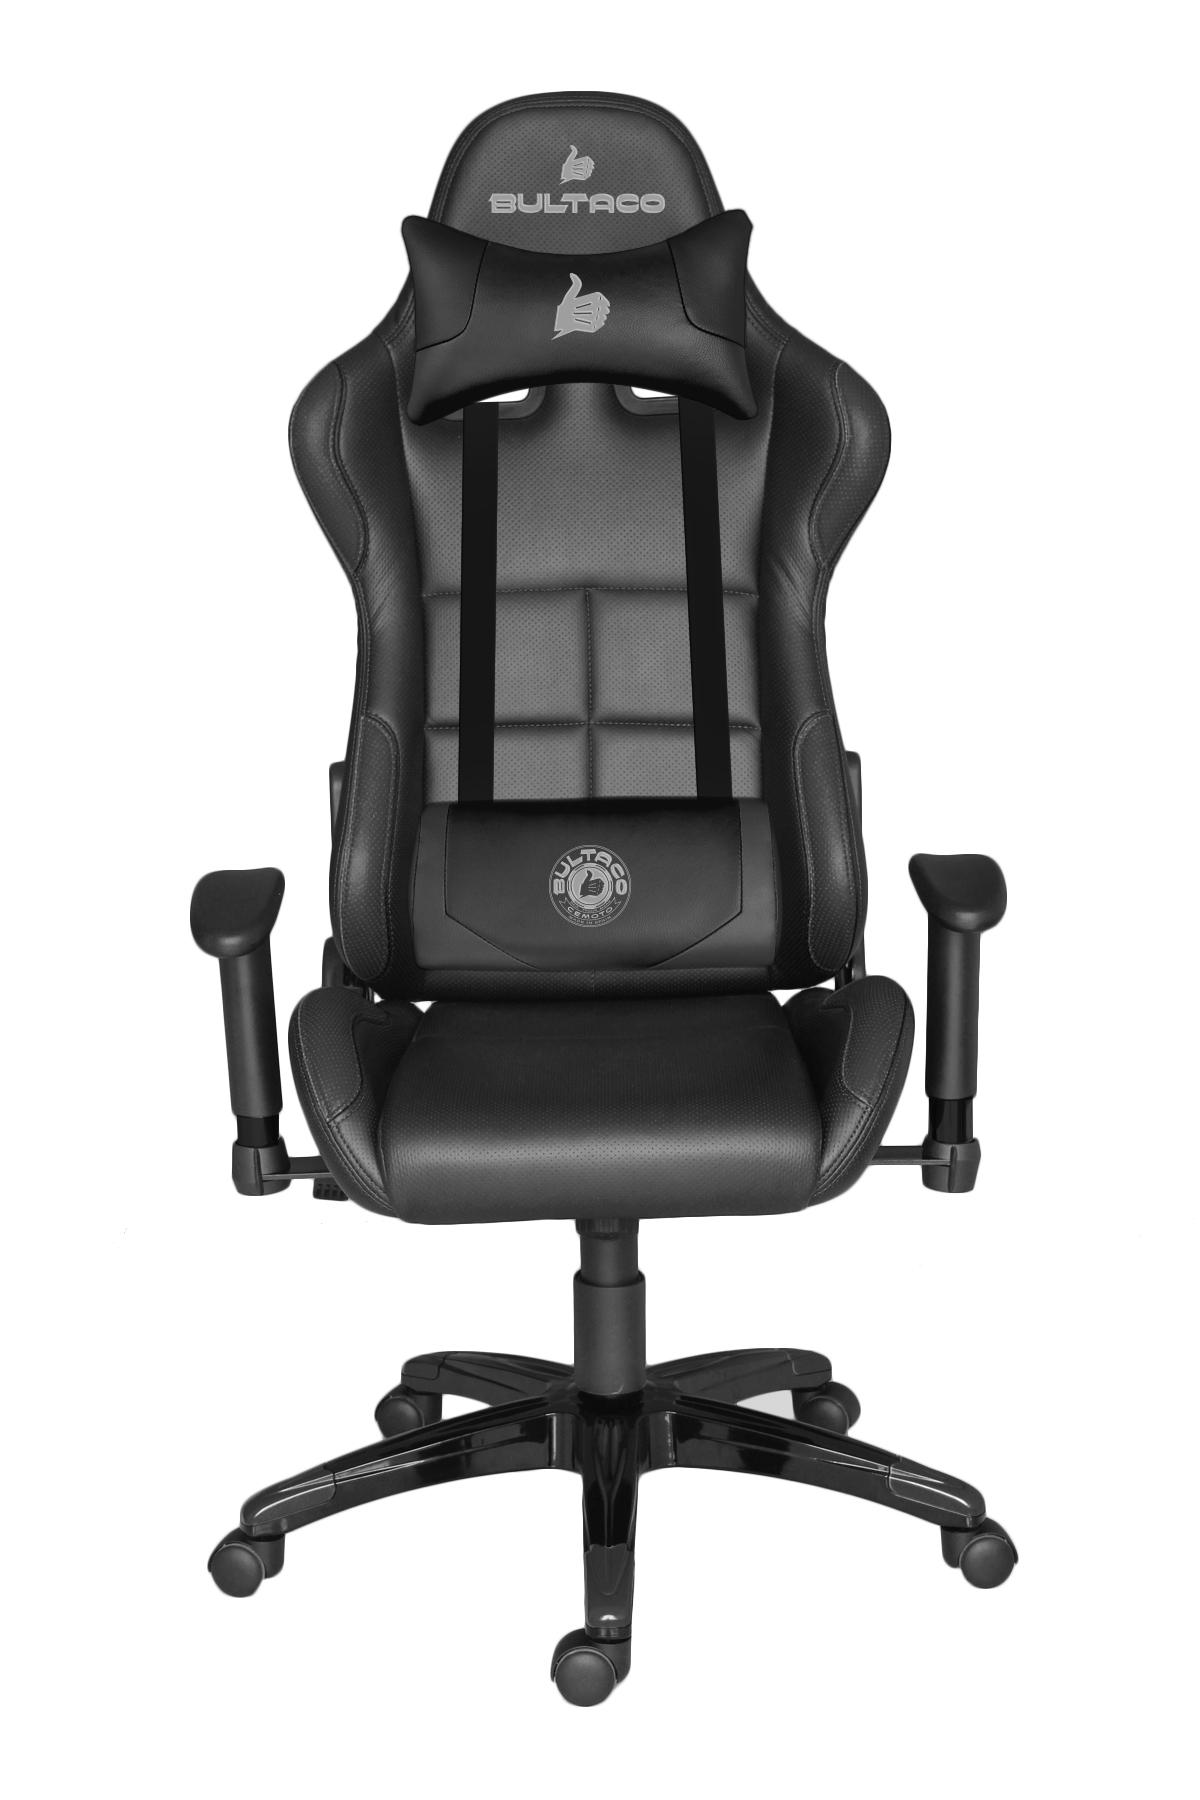 Bultaco gaming division negro silla gaming for Precio de silla gamer